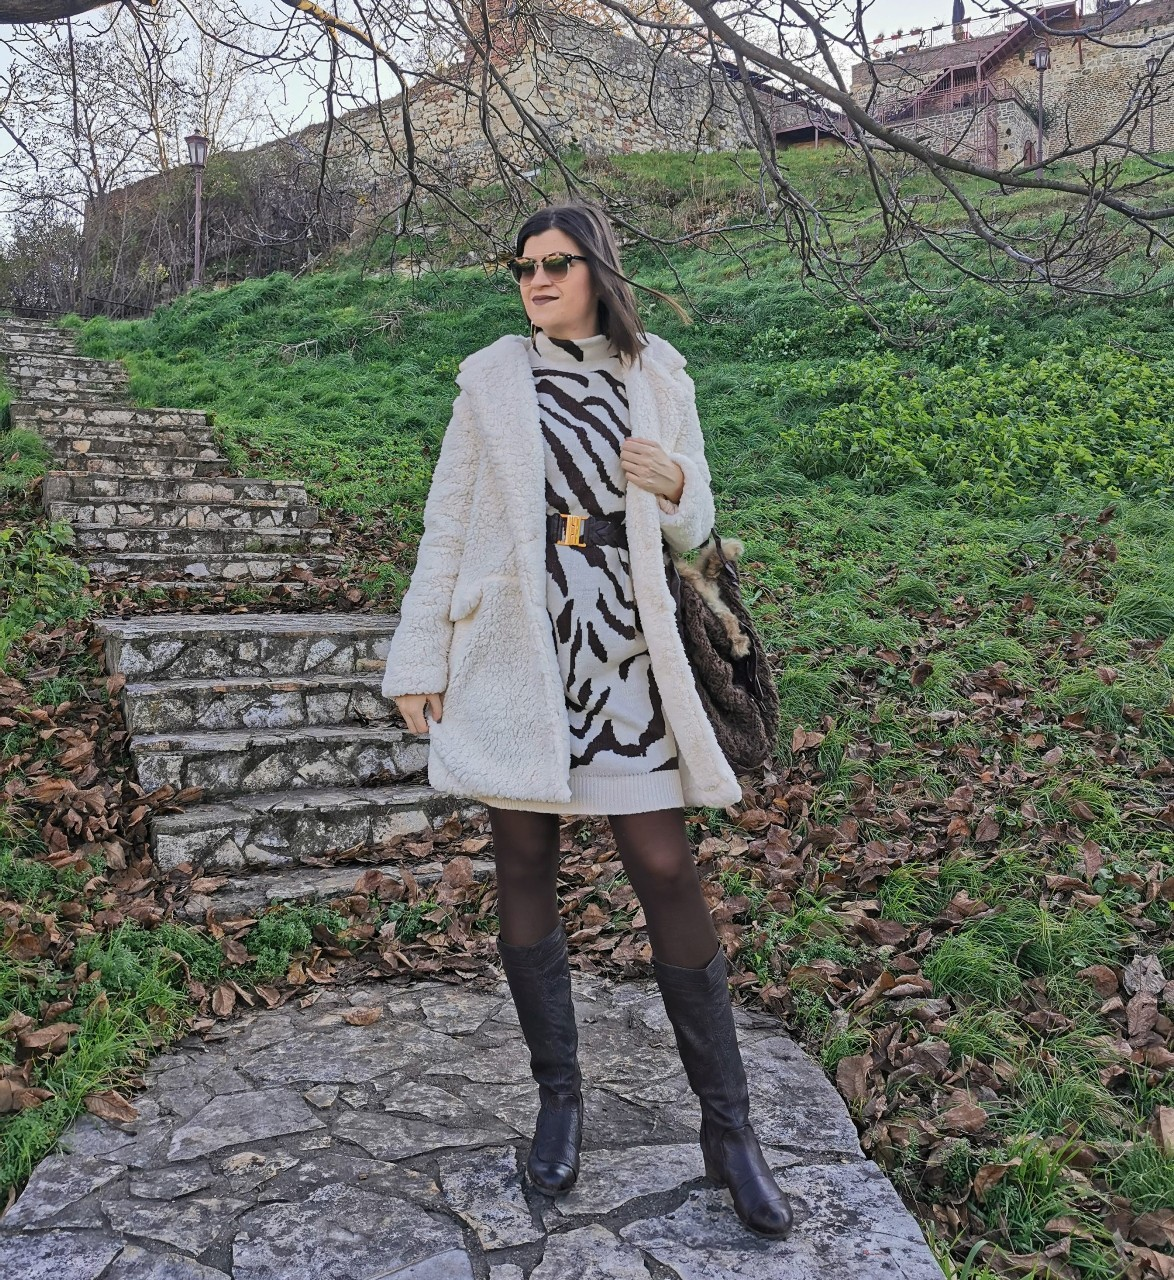 Teddy Coat & Zebra Dress Outfit Idea